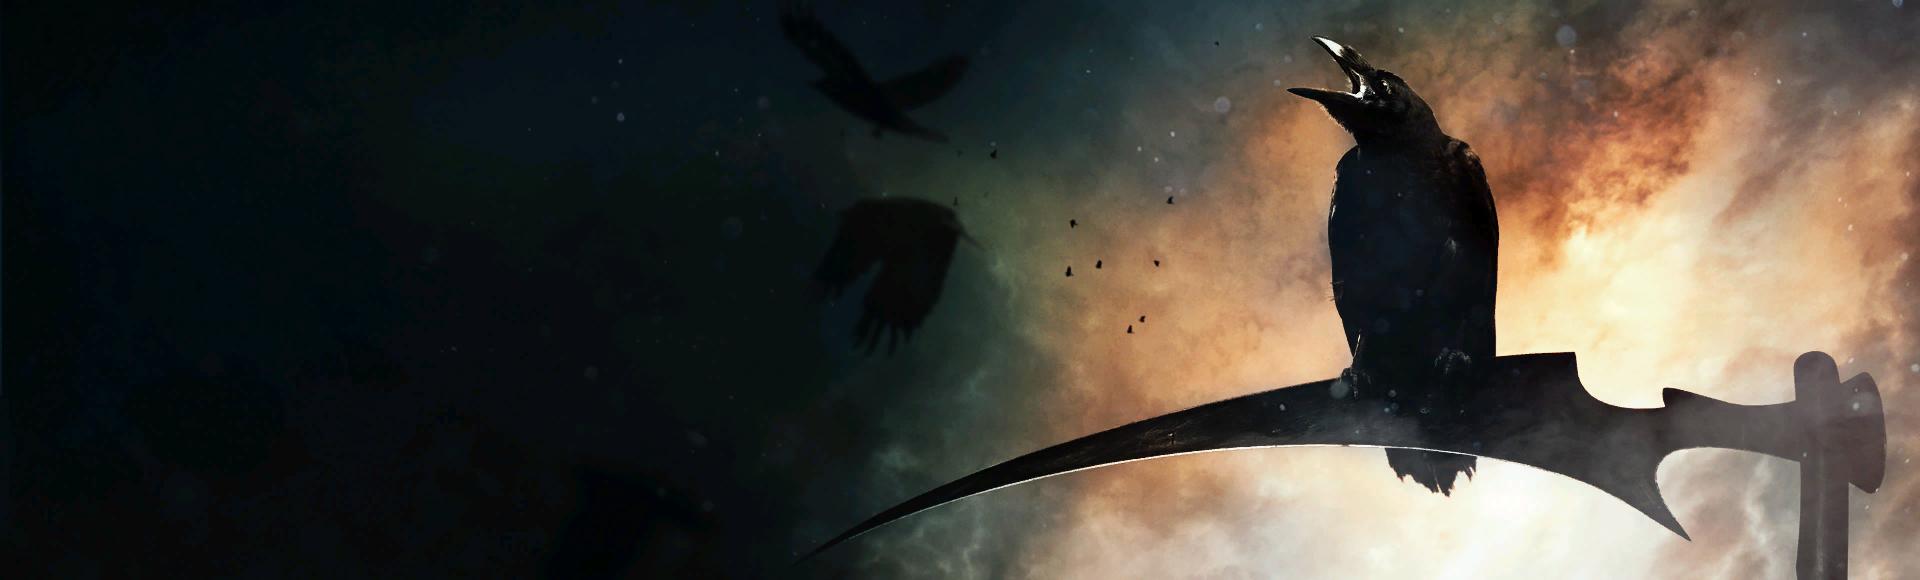 Bundle billboard of Ghost: Grim Reaper